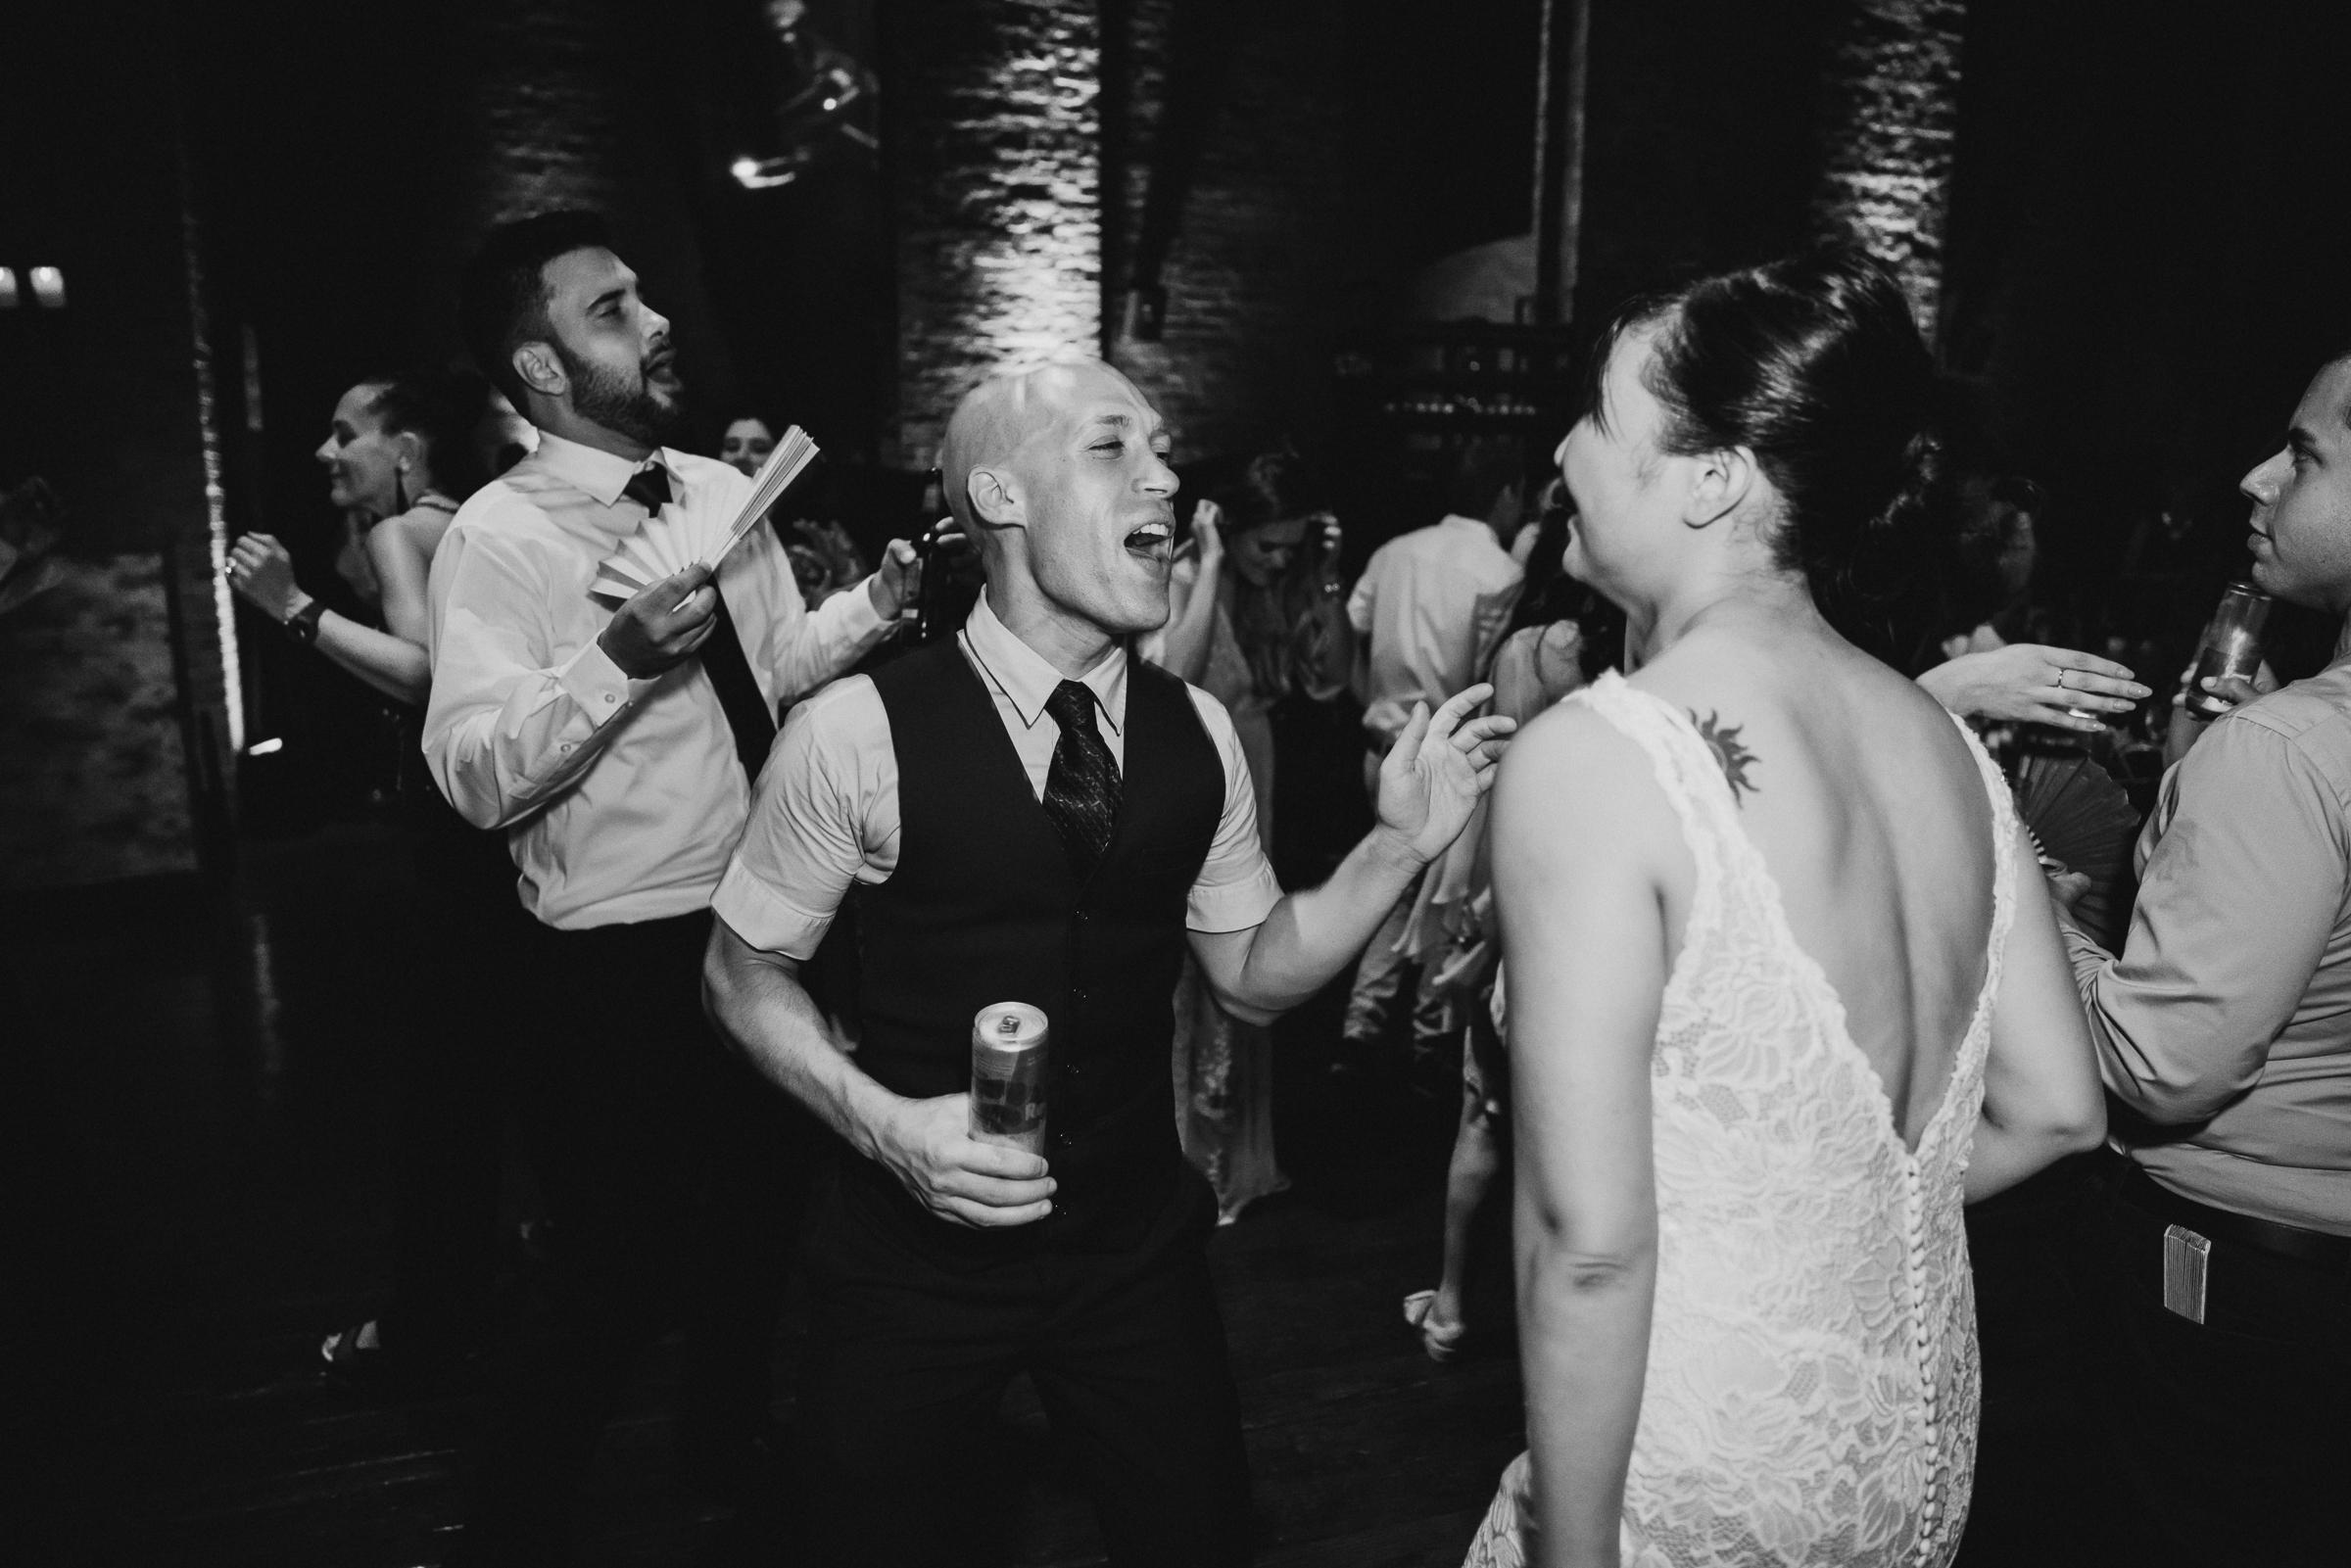 My-Moon-Brooklyn-LGBT-Gay-Documentary-Wedding-Photographer-114.jpg